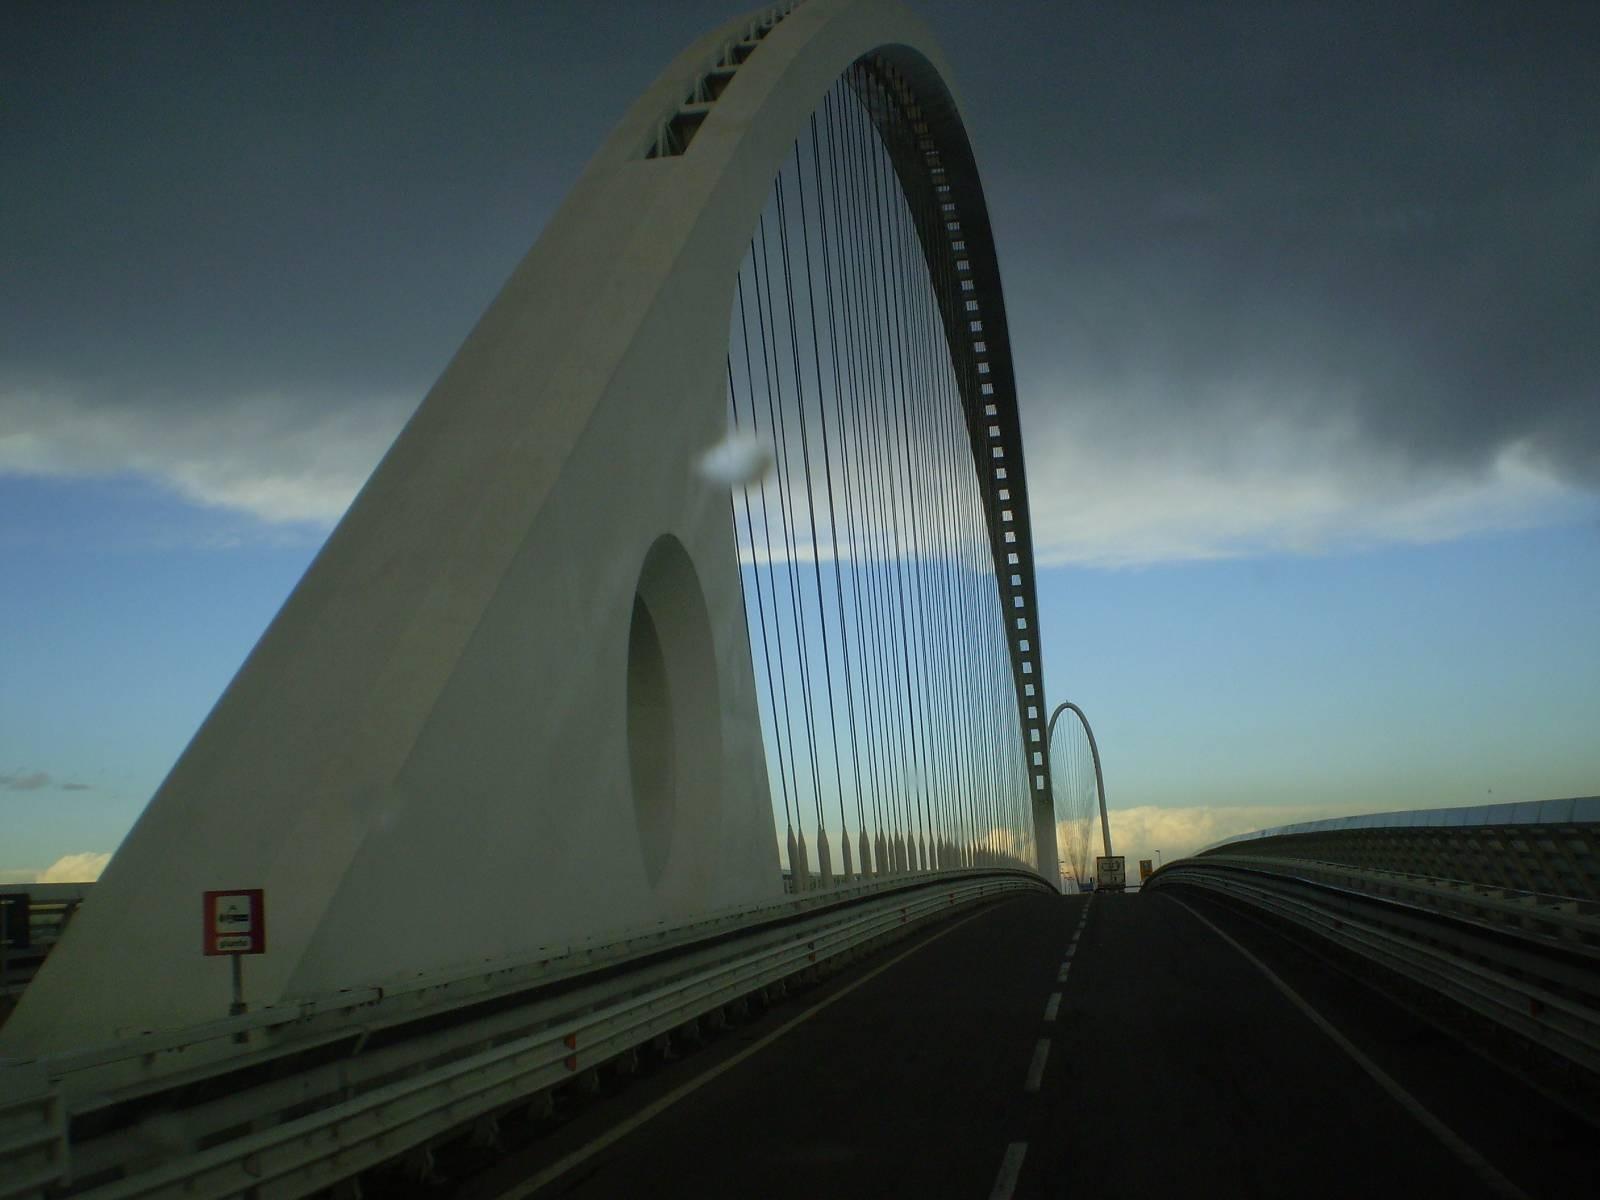 Novi most kod mesta Reggio nel Emilia